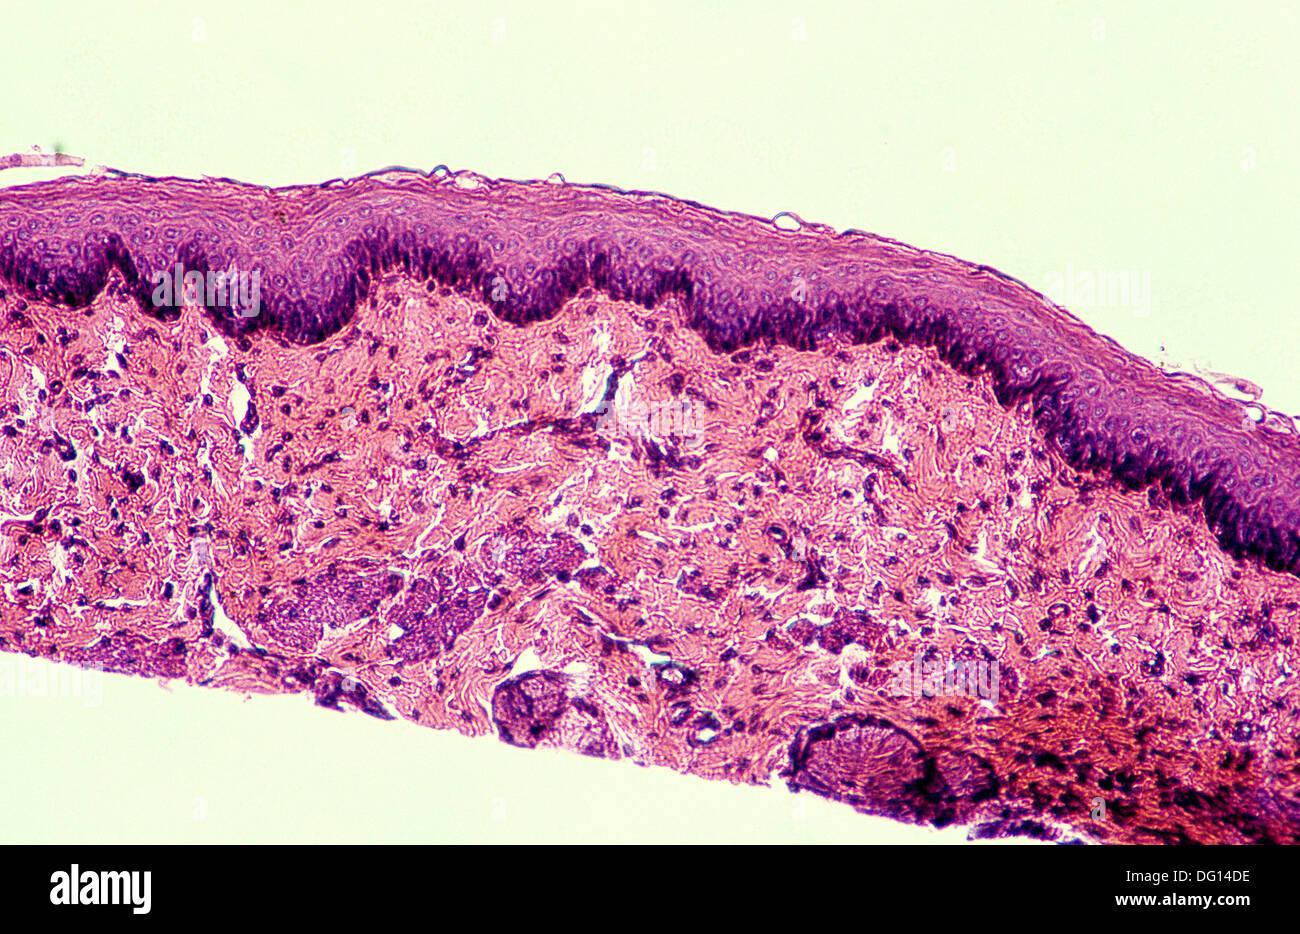 Stratified flat epithelium, 200 X. Epithelium rests on connective tissue below. Skin, keratin. optical microscope, - Stock Image